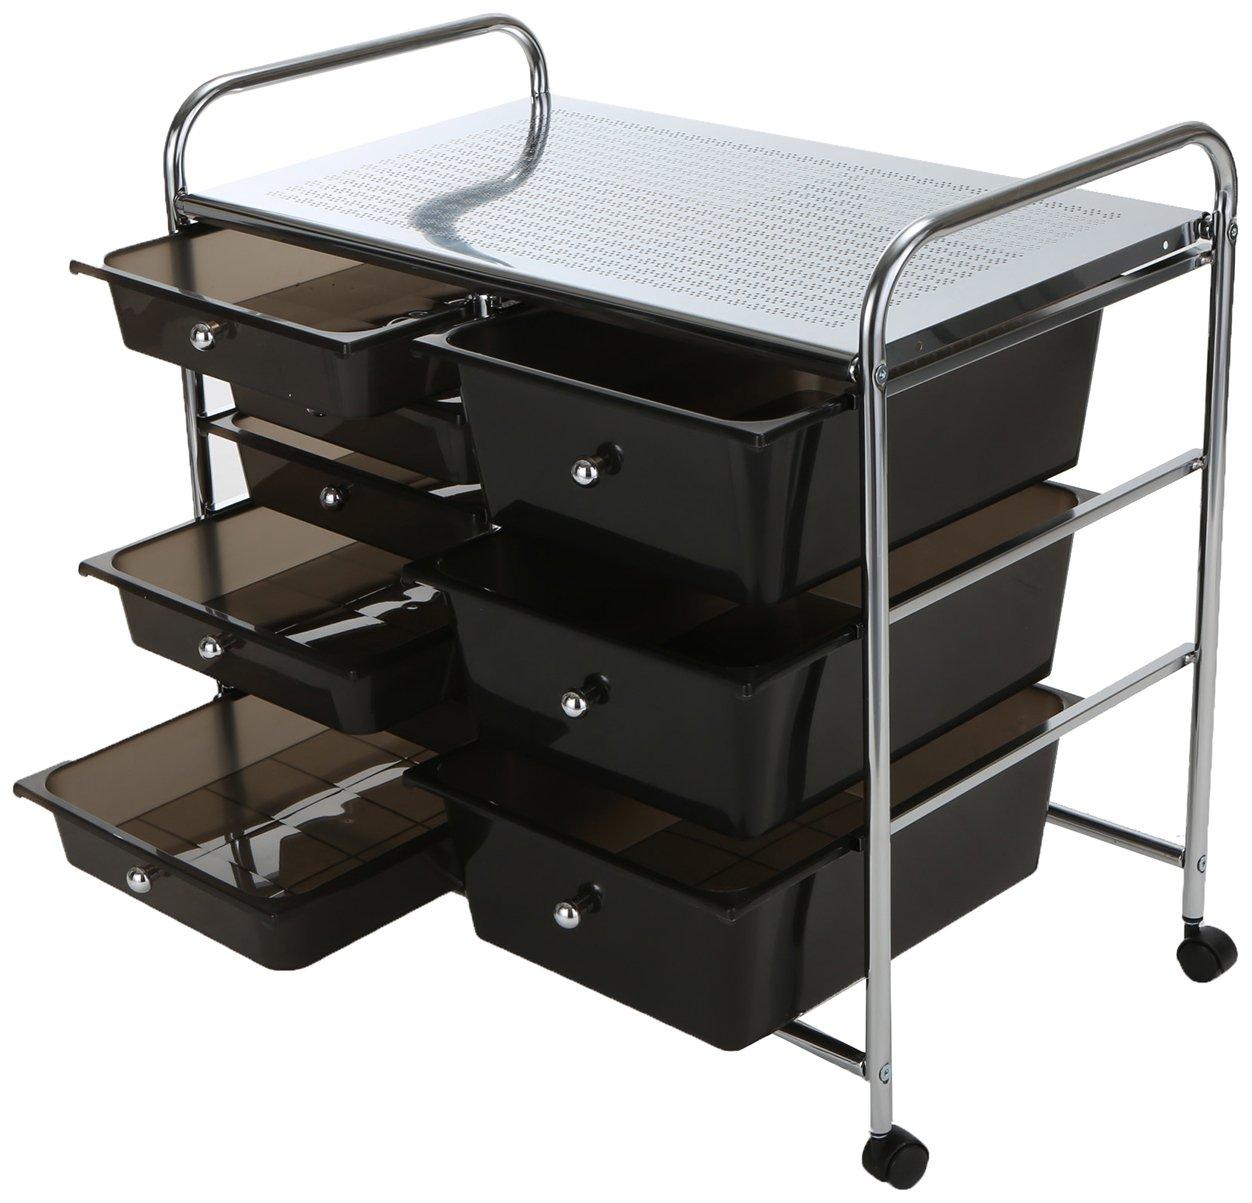 Mind Reader Storage Drawer Rolling Utility Cart, 9 Drawer Organizer, Black by Mind Reader